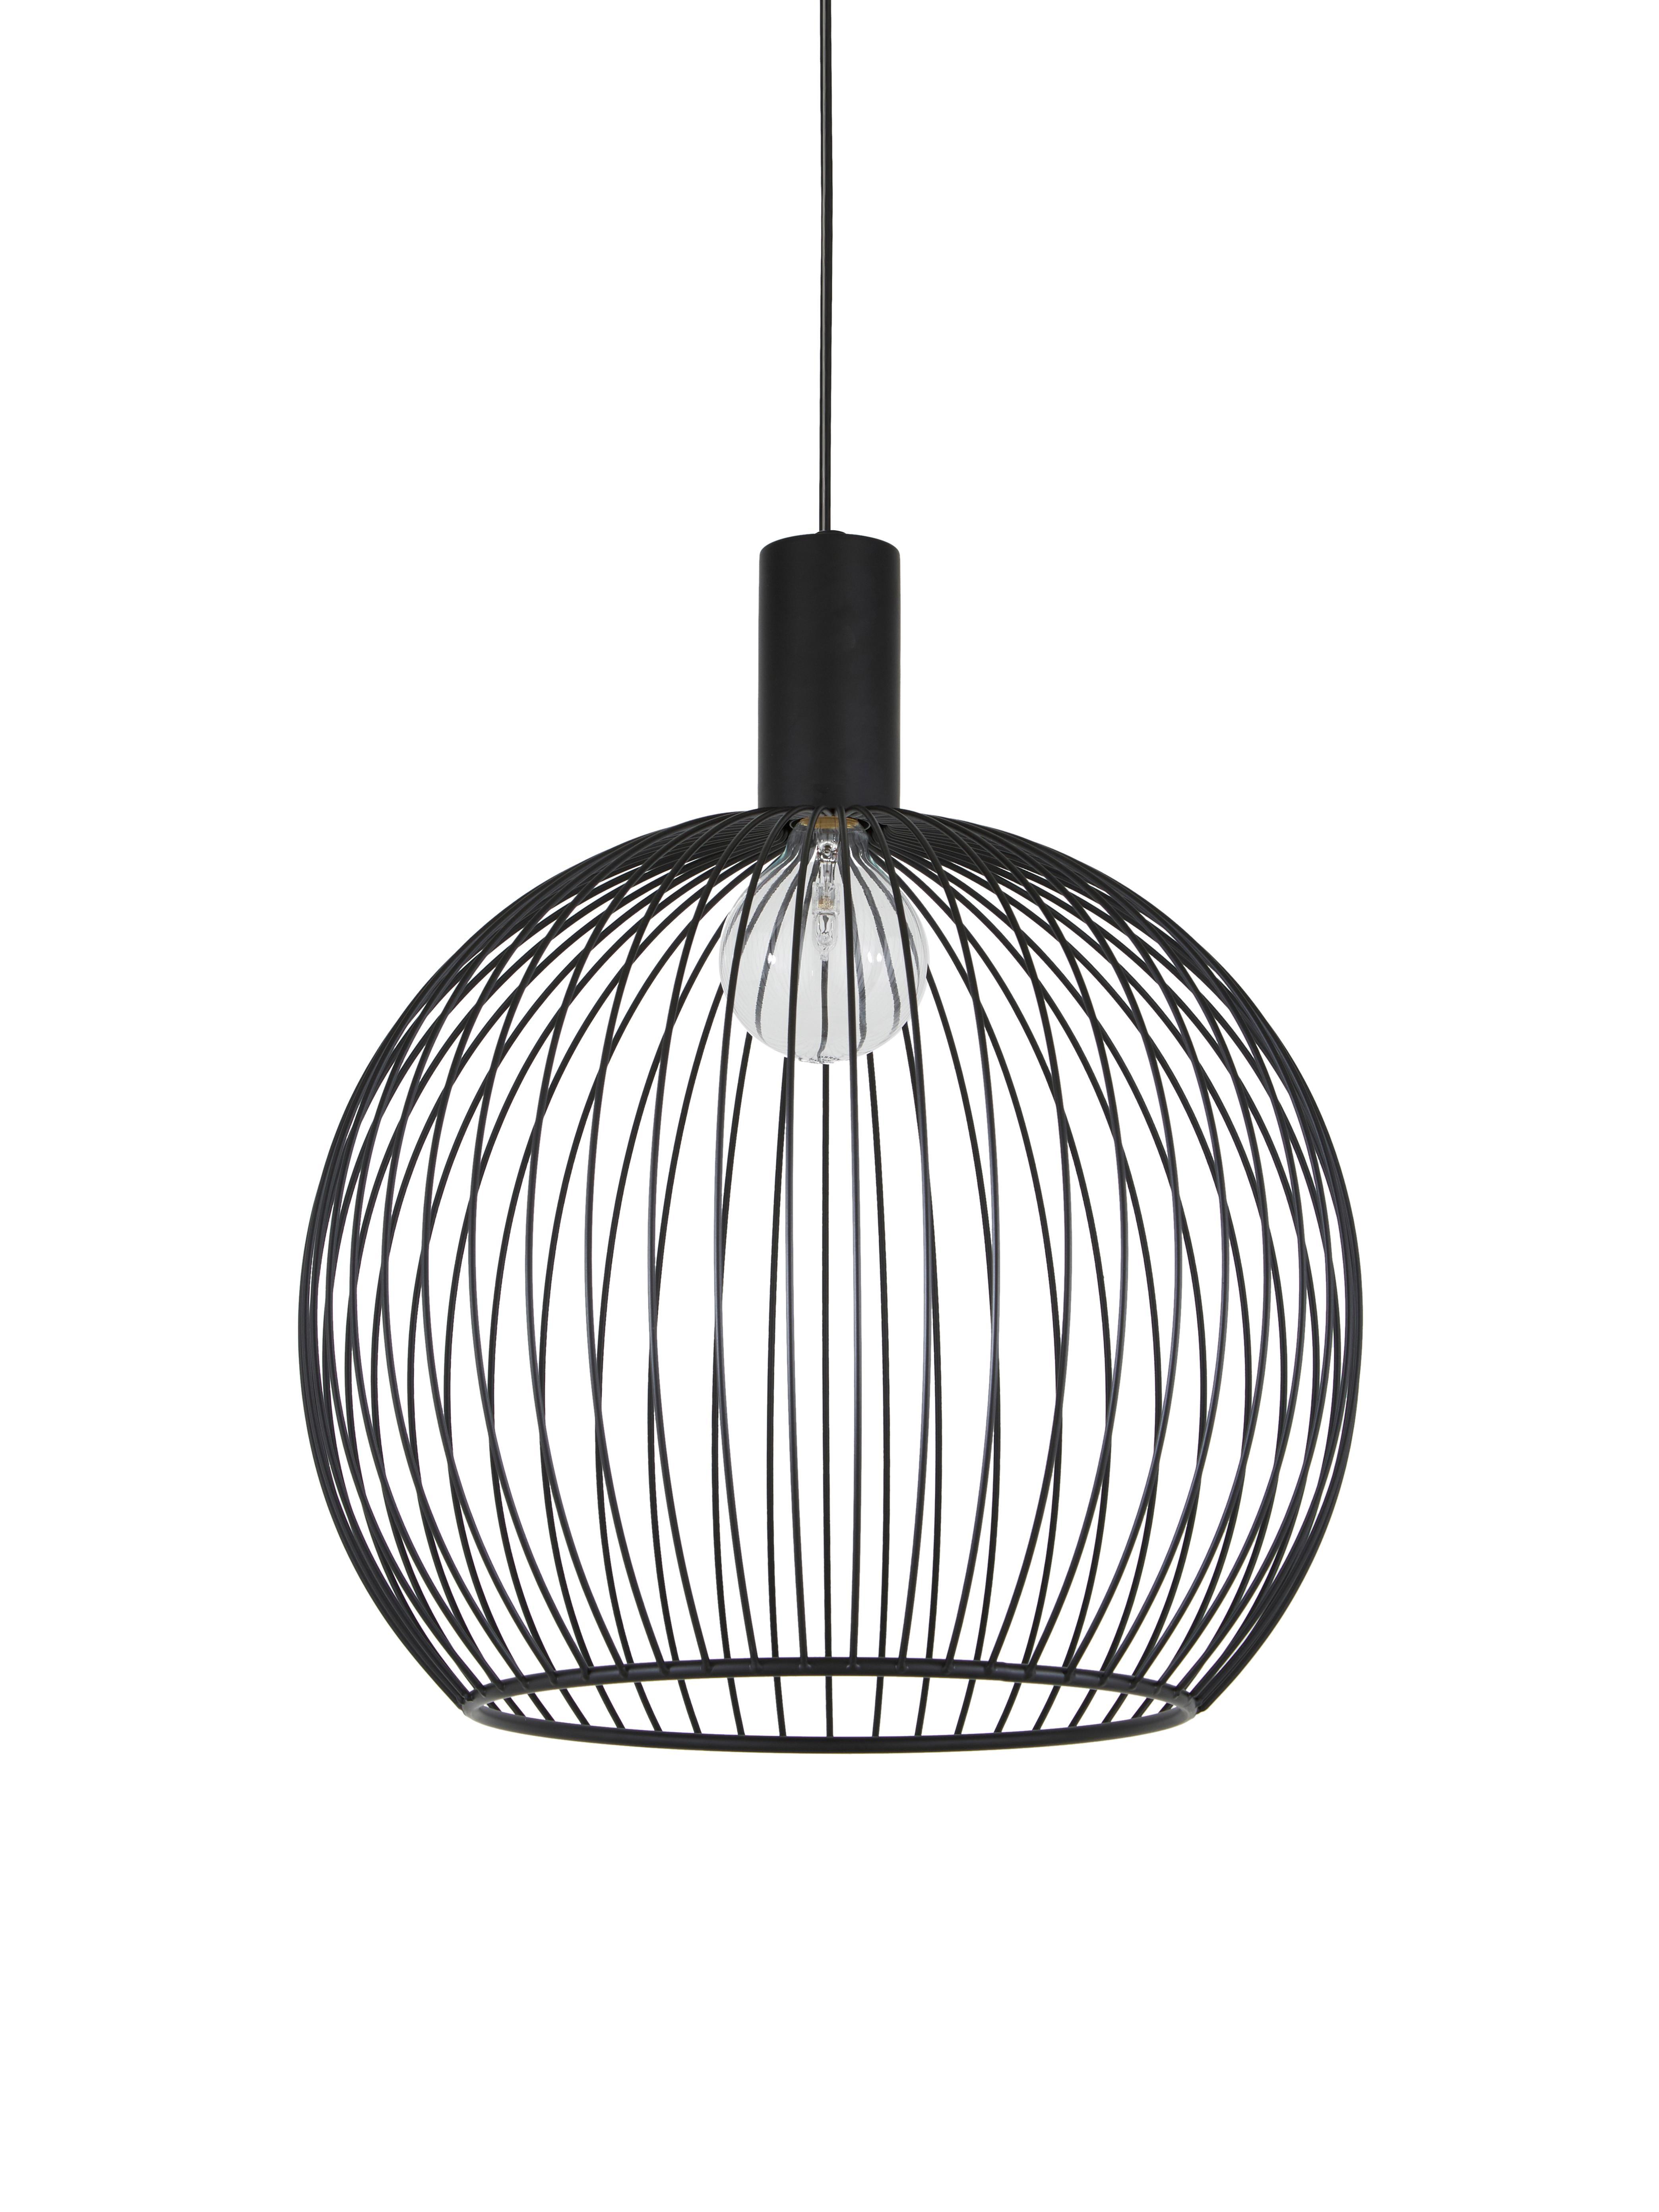 Design hanglamp Aver, Lampenkap: gelakt staal, Baldakijn: kunststof, Zwart, Ø 50 x H 55 cm